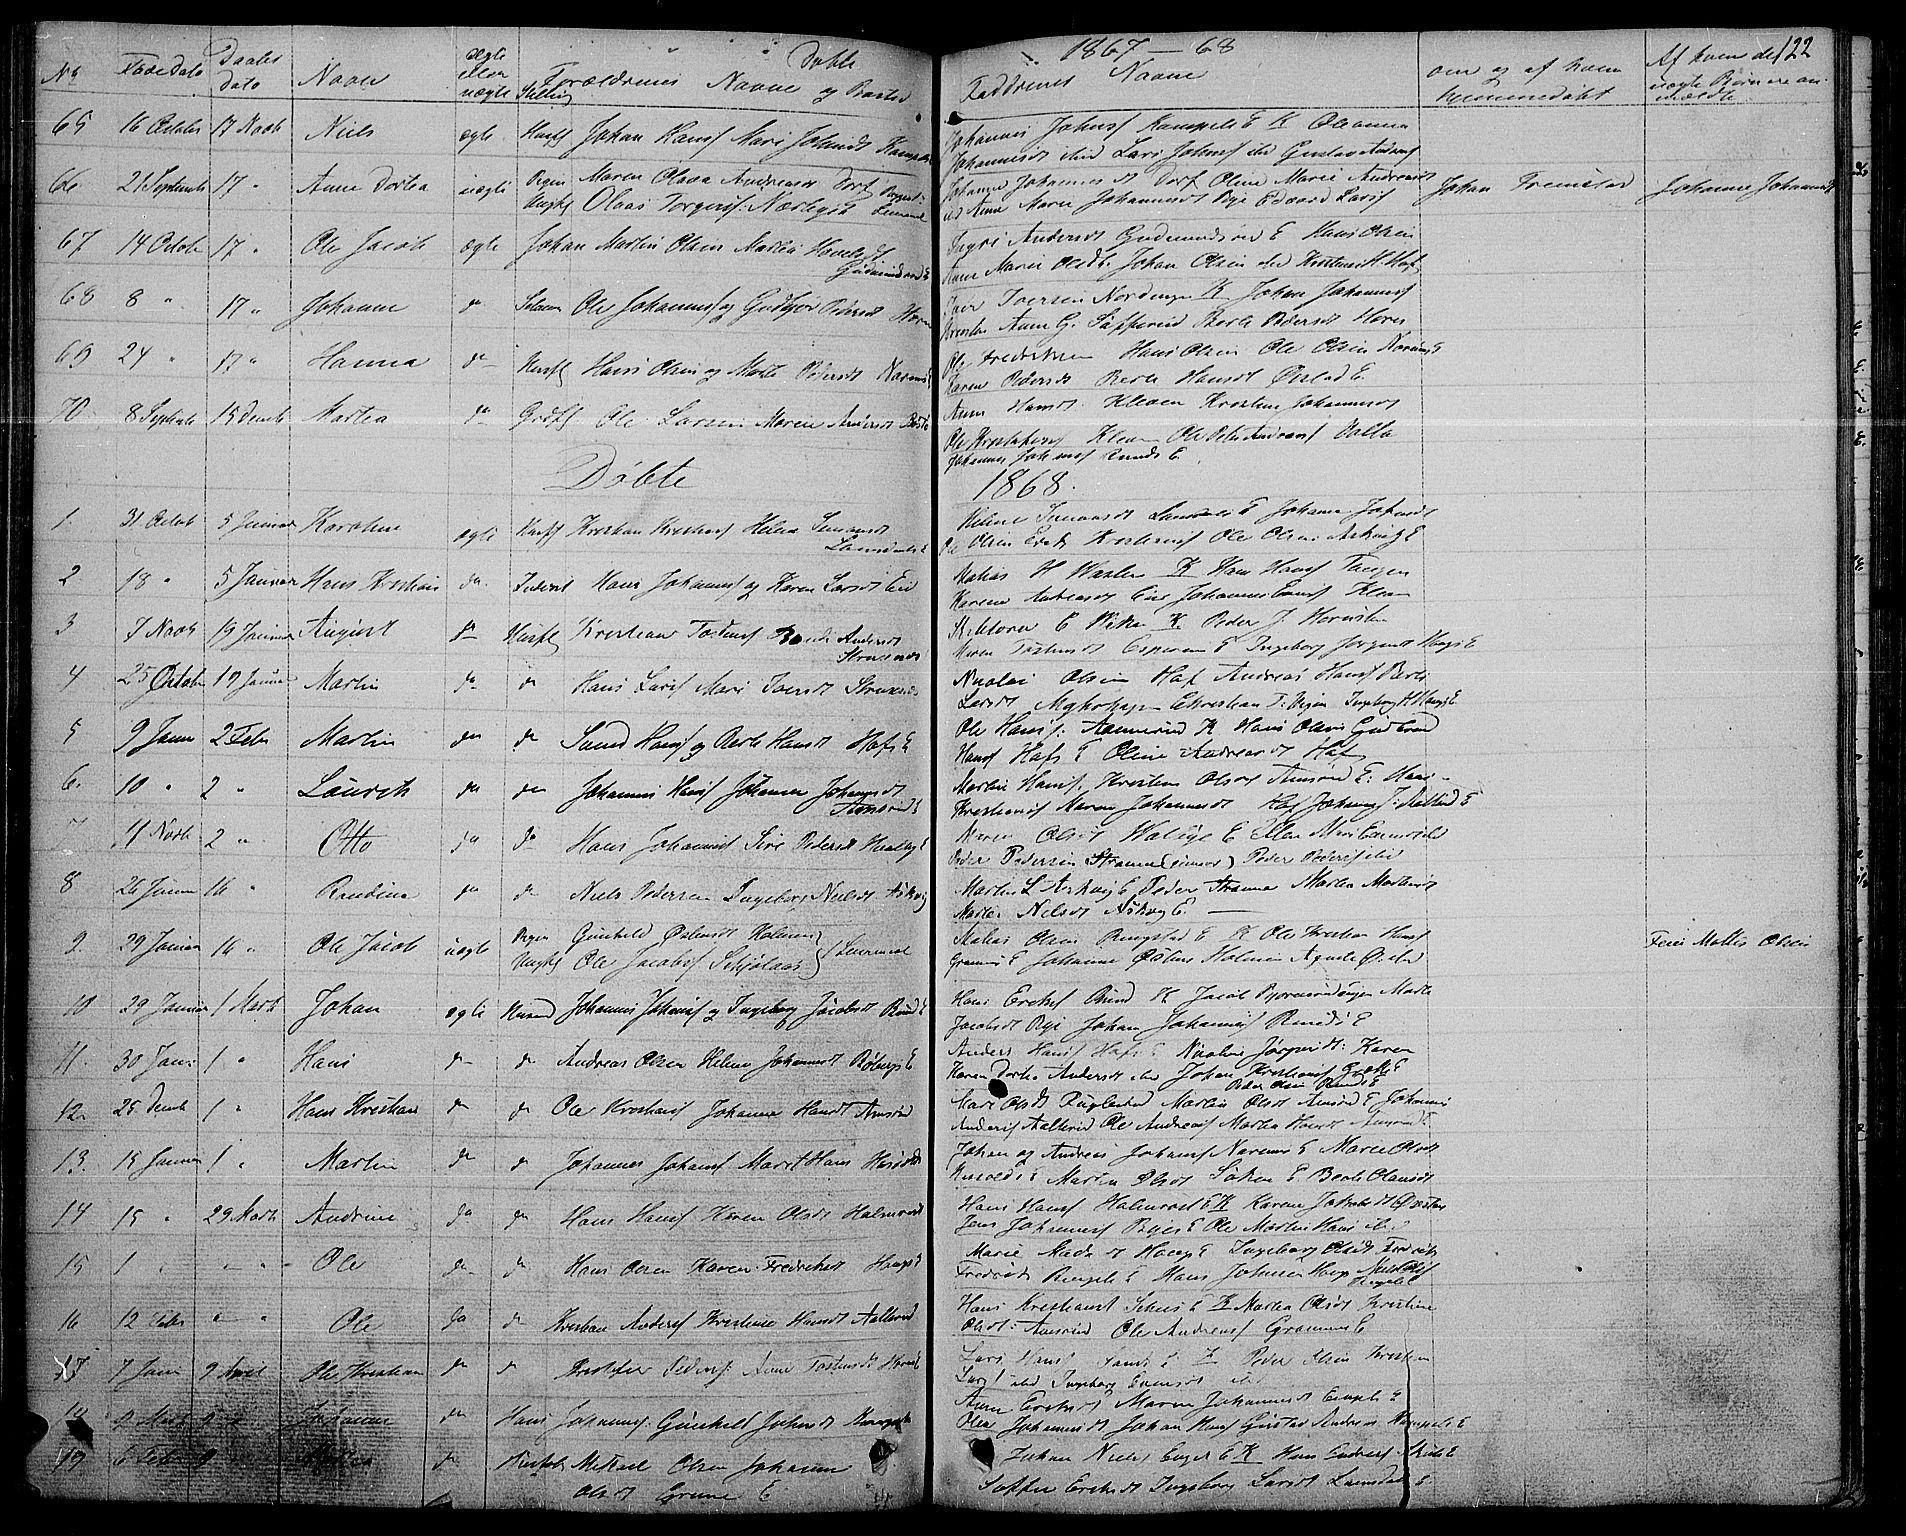 SAH, Søndre Land prestekontor, L/L0001: Klokkerbok nr. 1, 1849-1883, s. 122